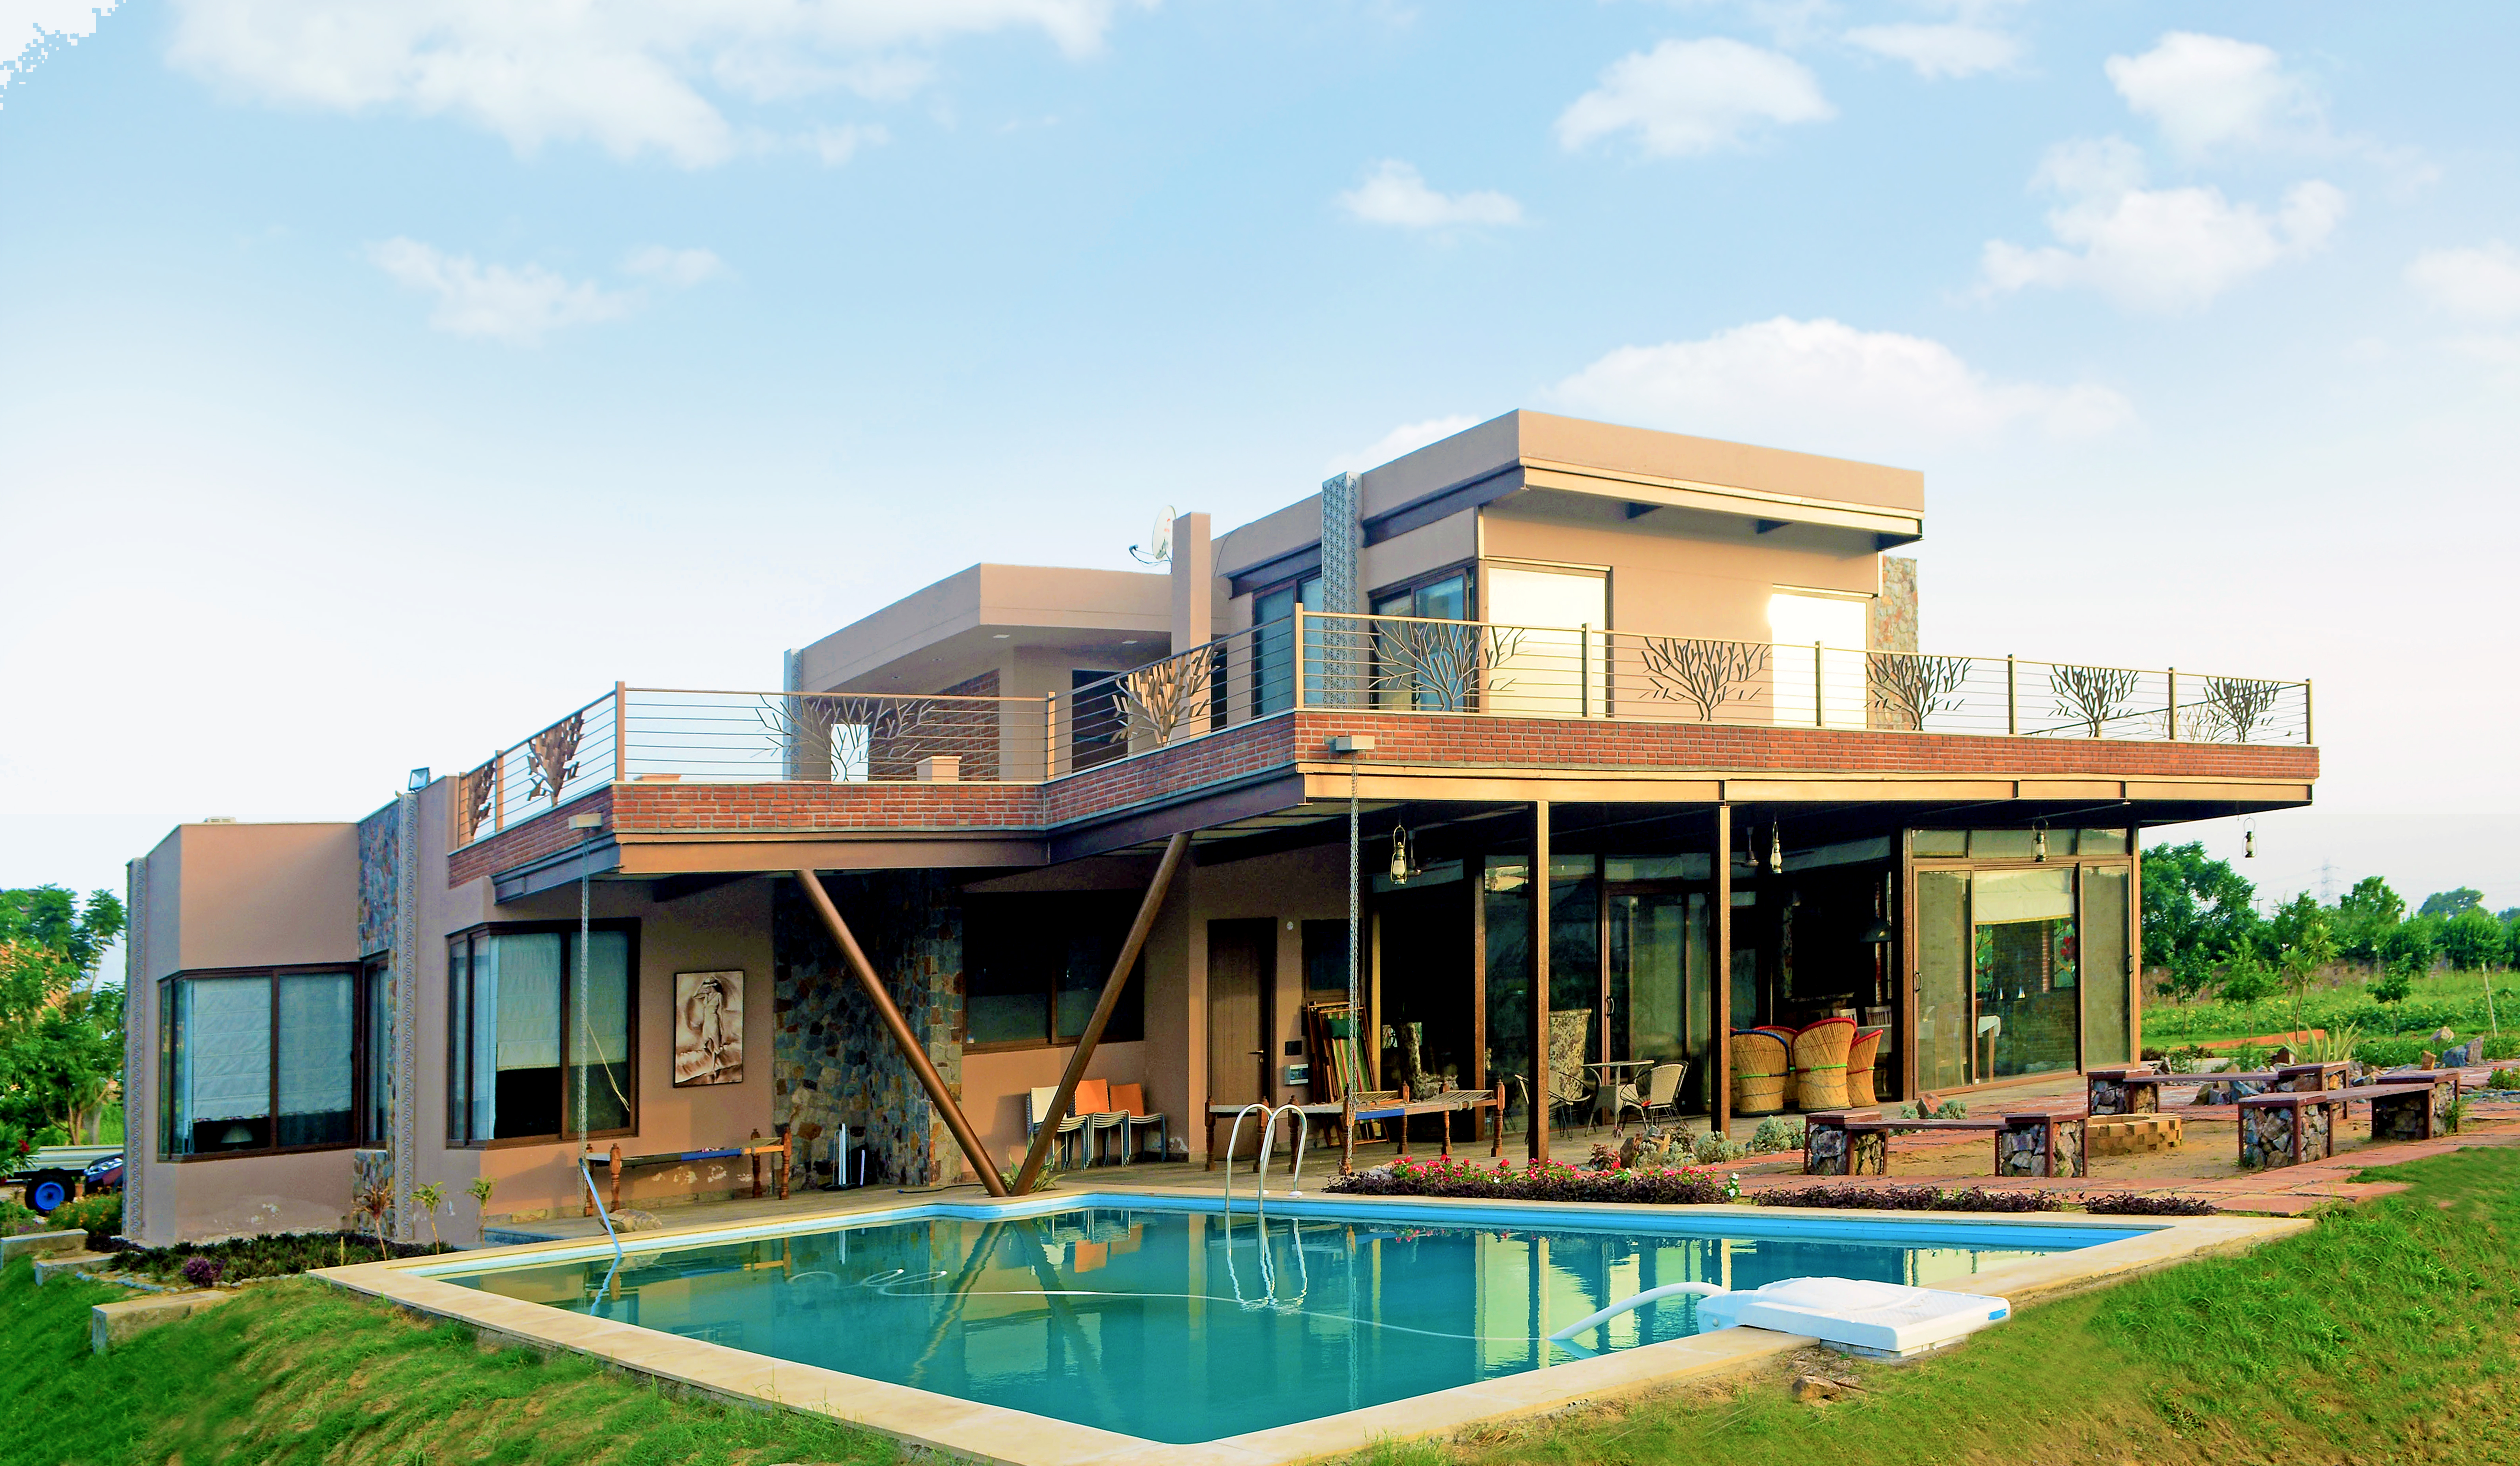 2. Farm House - Pool Side